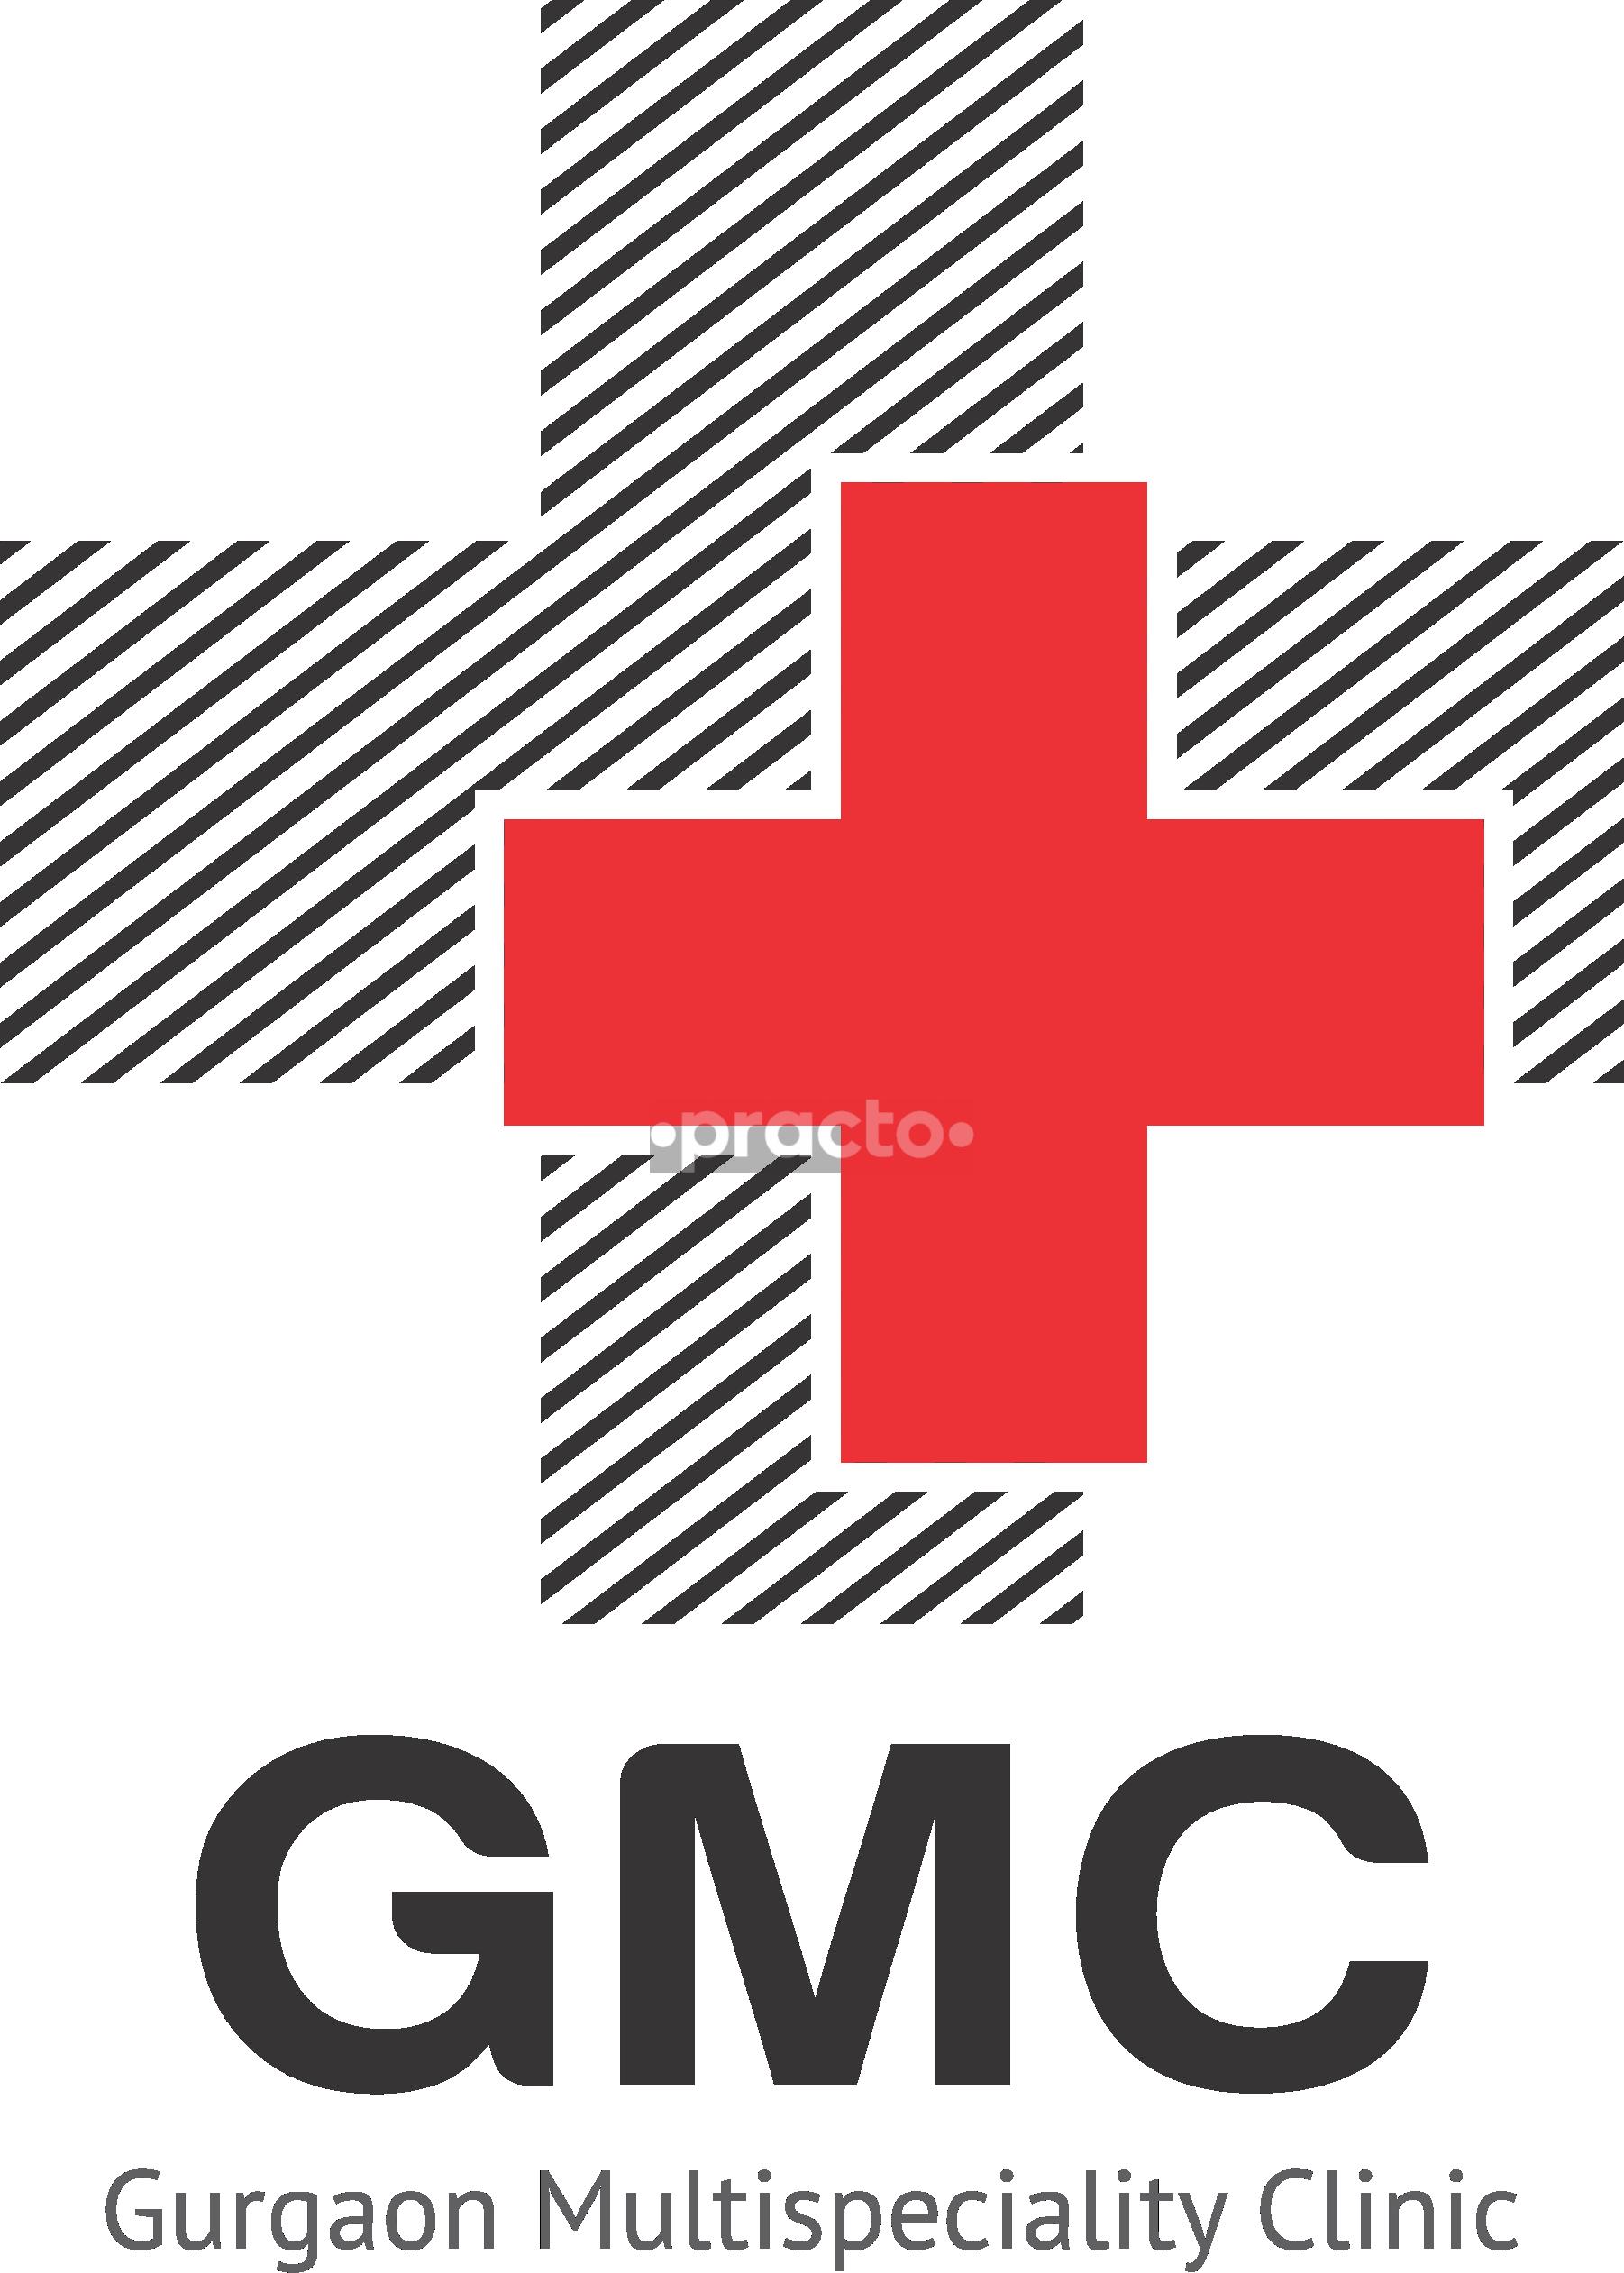 Gurgaon Multispeciality Clinic